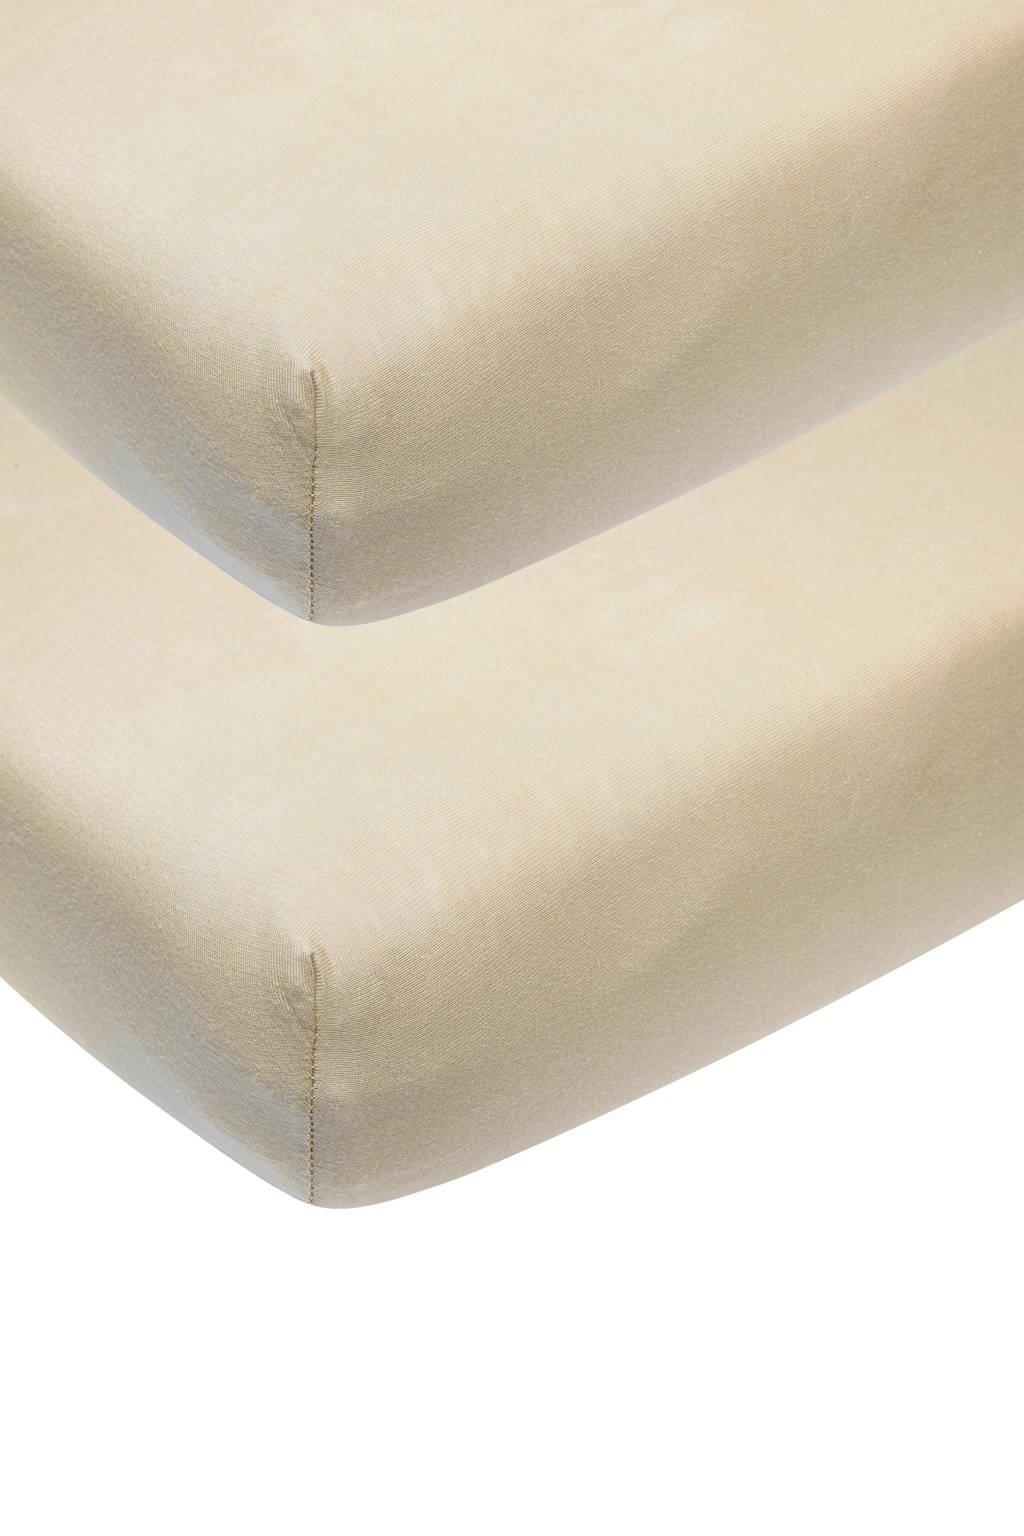 Meyco katoenen jersey hoeslaken wieg 40x80/90 cm (set van 2) Zand